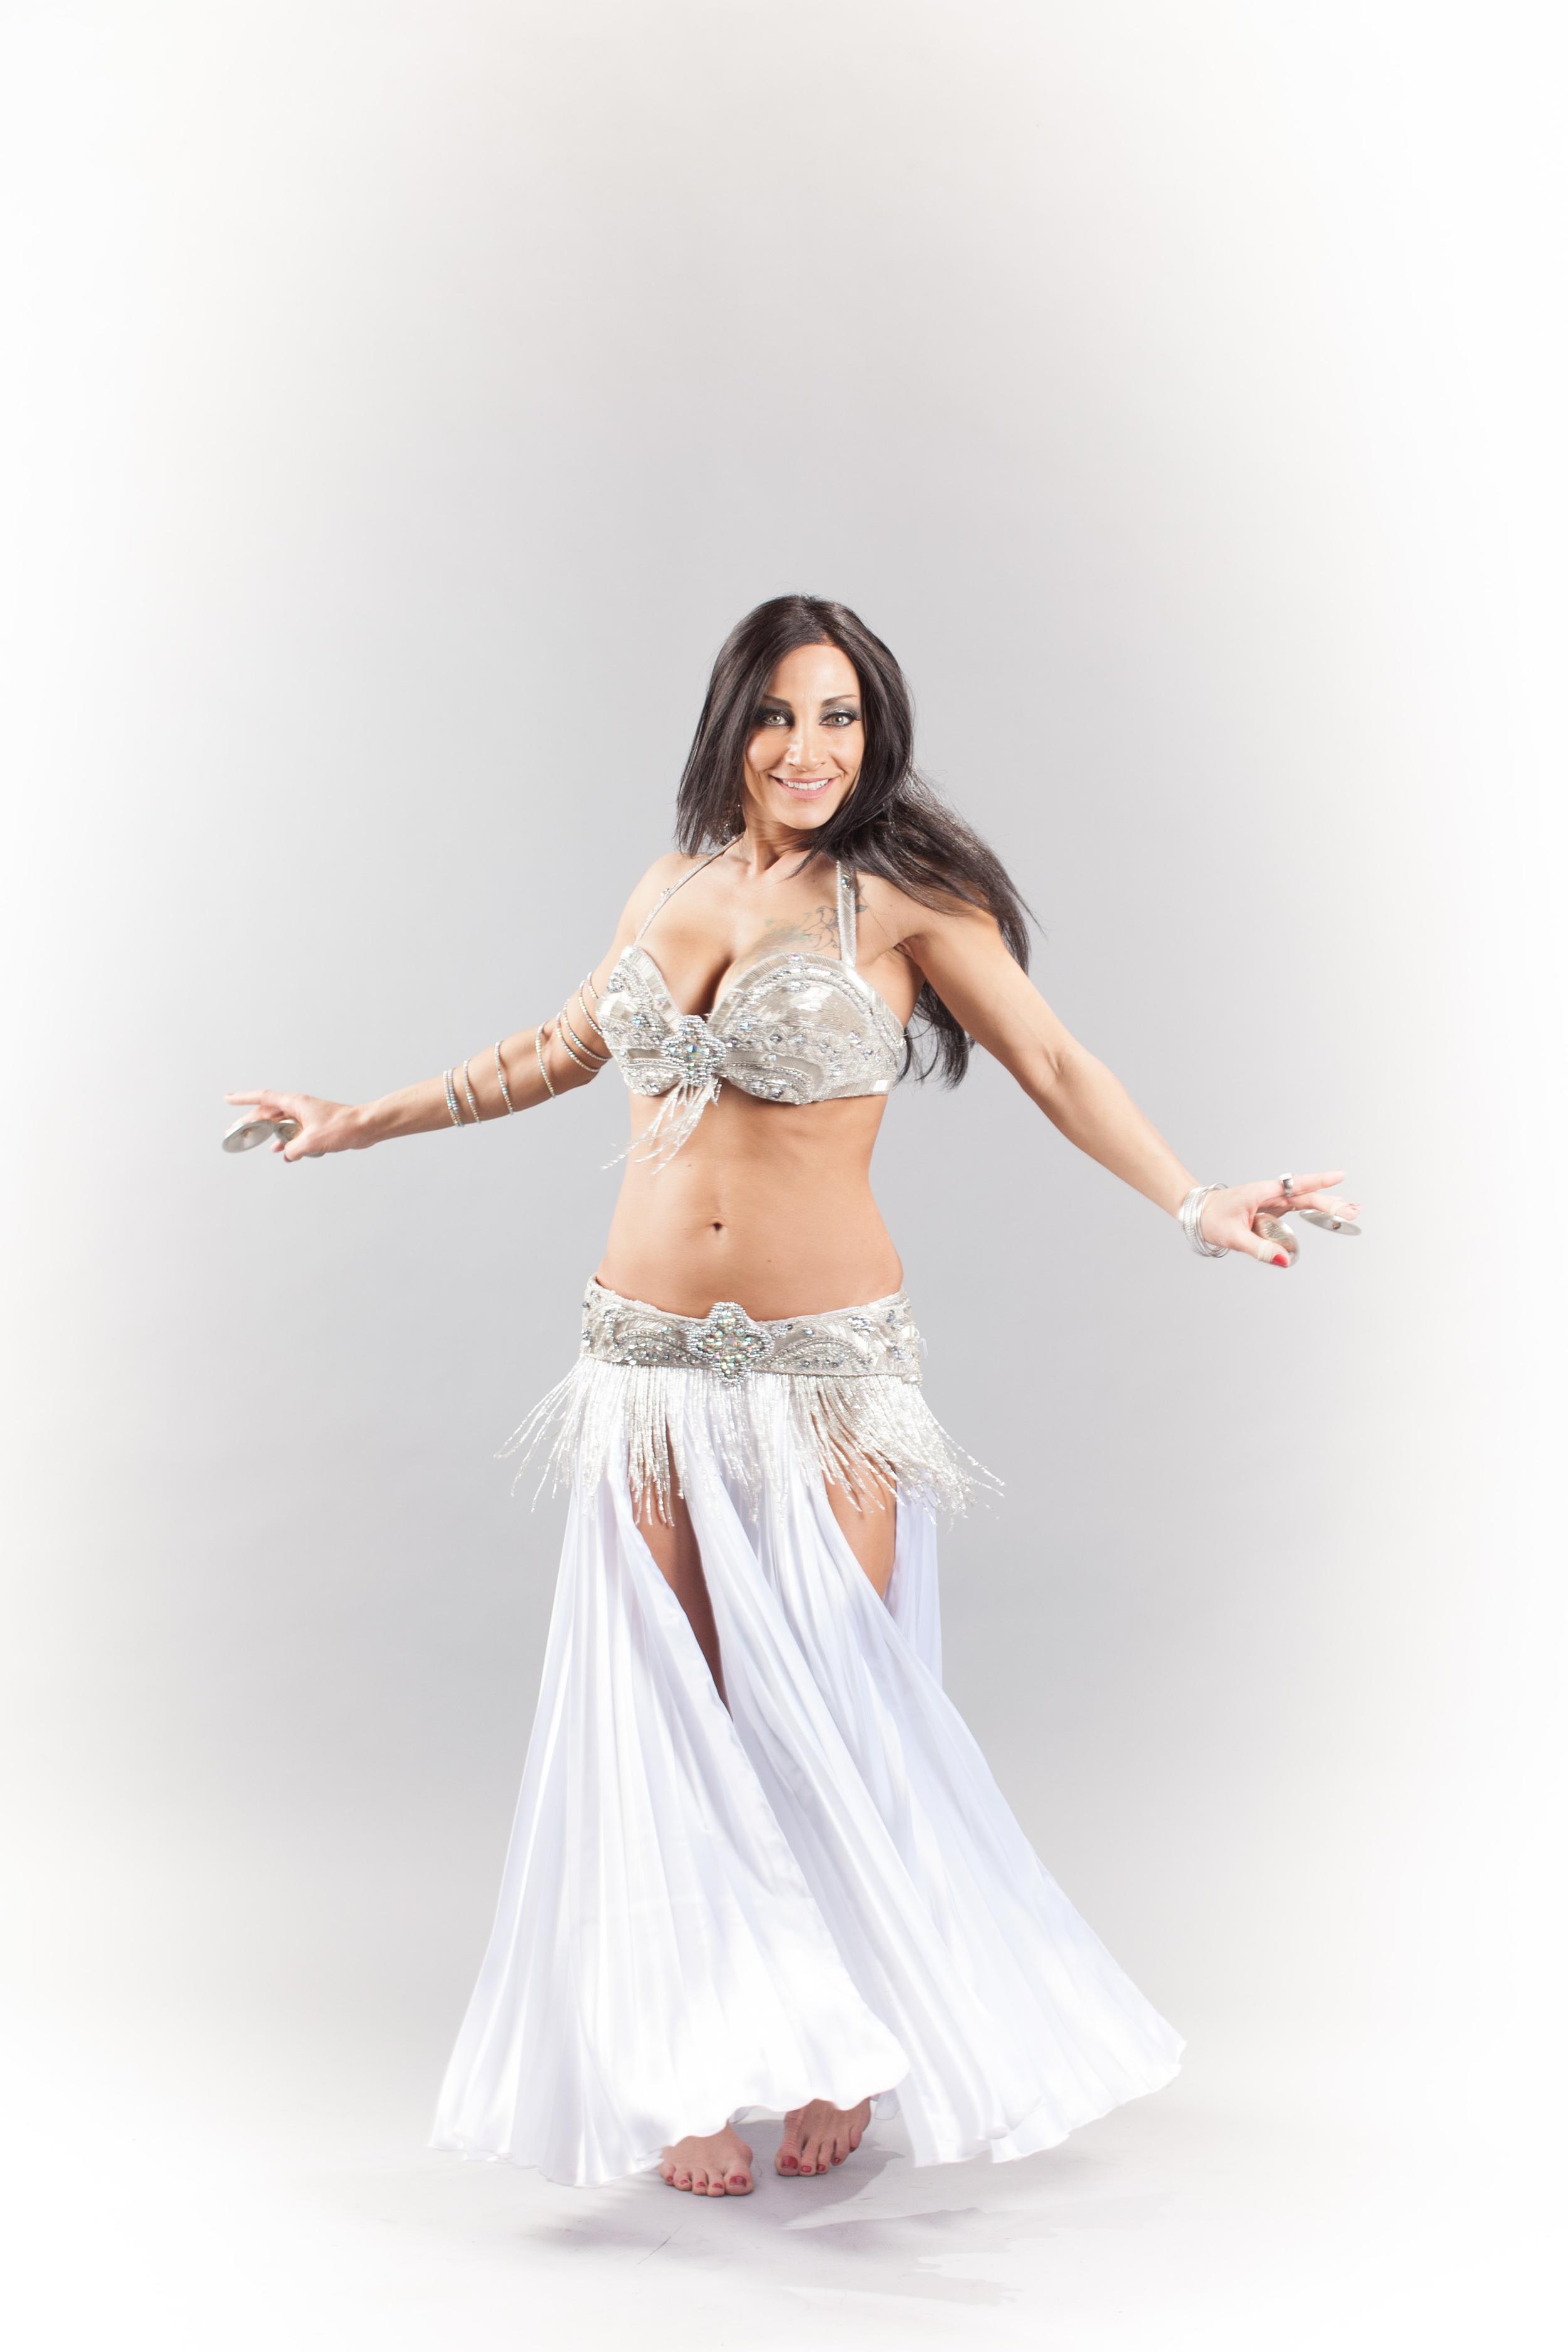 Mahsati Dancer unitymike photo (82 of 235).jpg